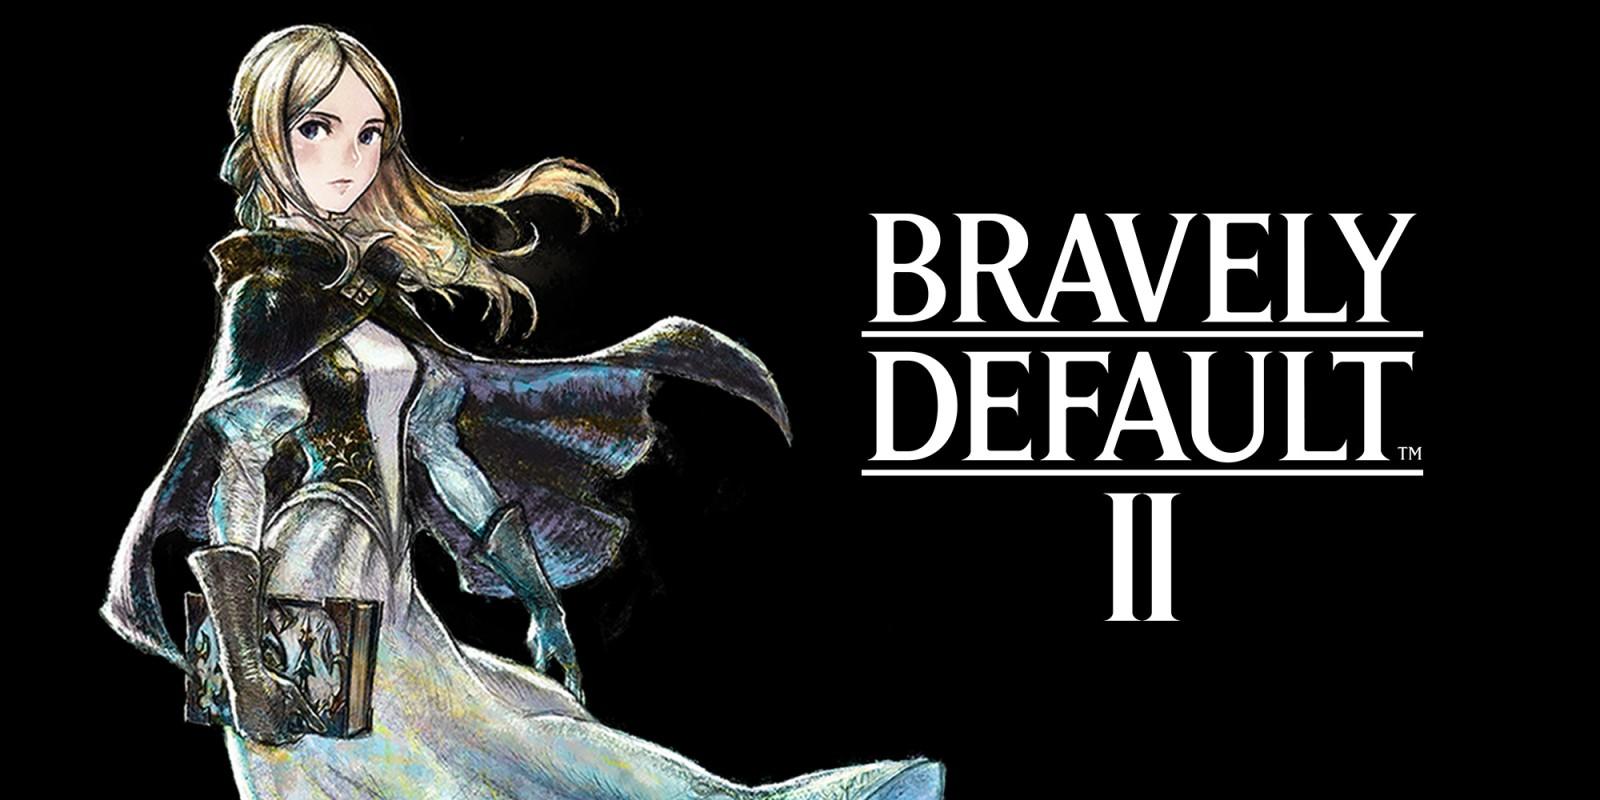 BRAVELY DEFAULT II Офлайн АВТО-АКТИВАЦИЯ Deluxe Edition🌎GLOBAL/PC